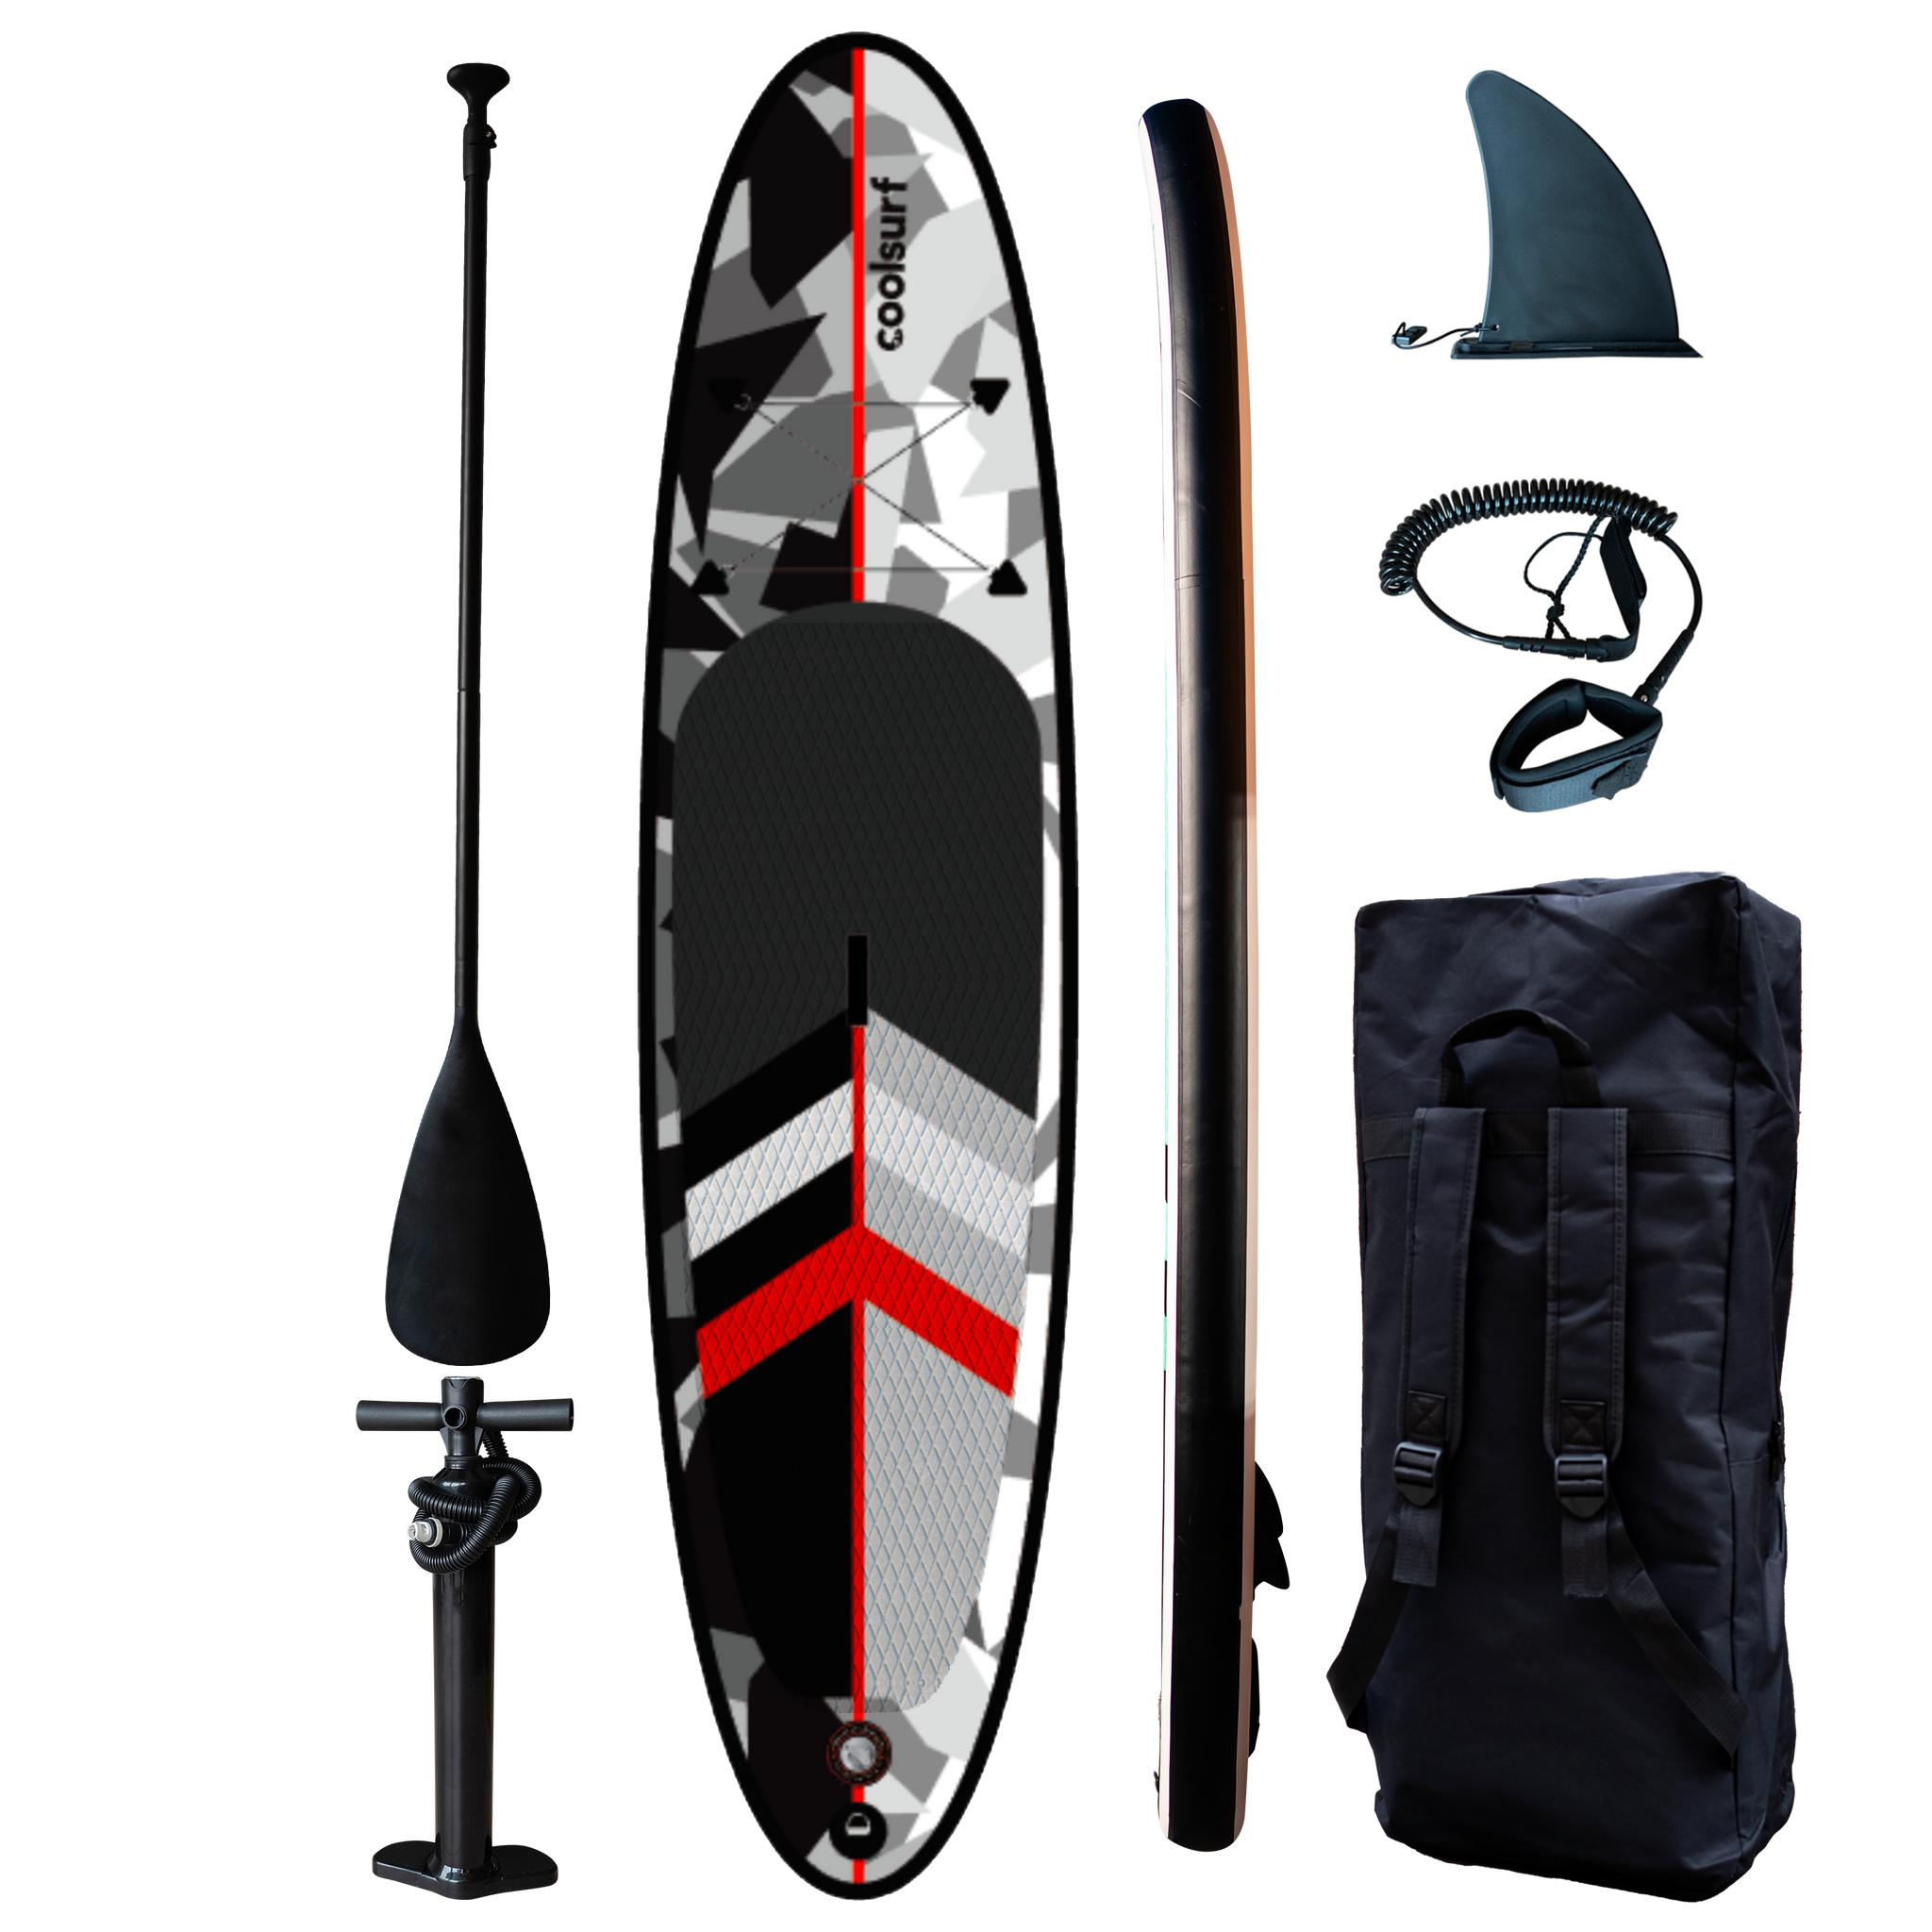 CoolSurf PHOENIX Kite Paddleboard - SUP Gonfiabile 10'4